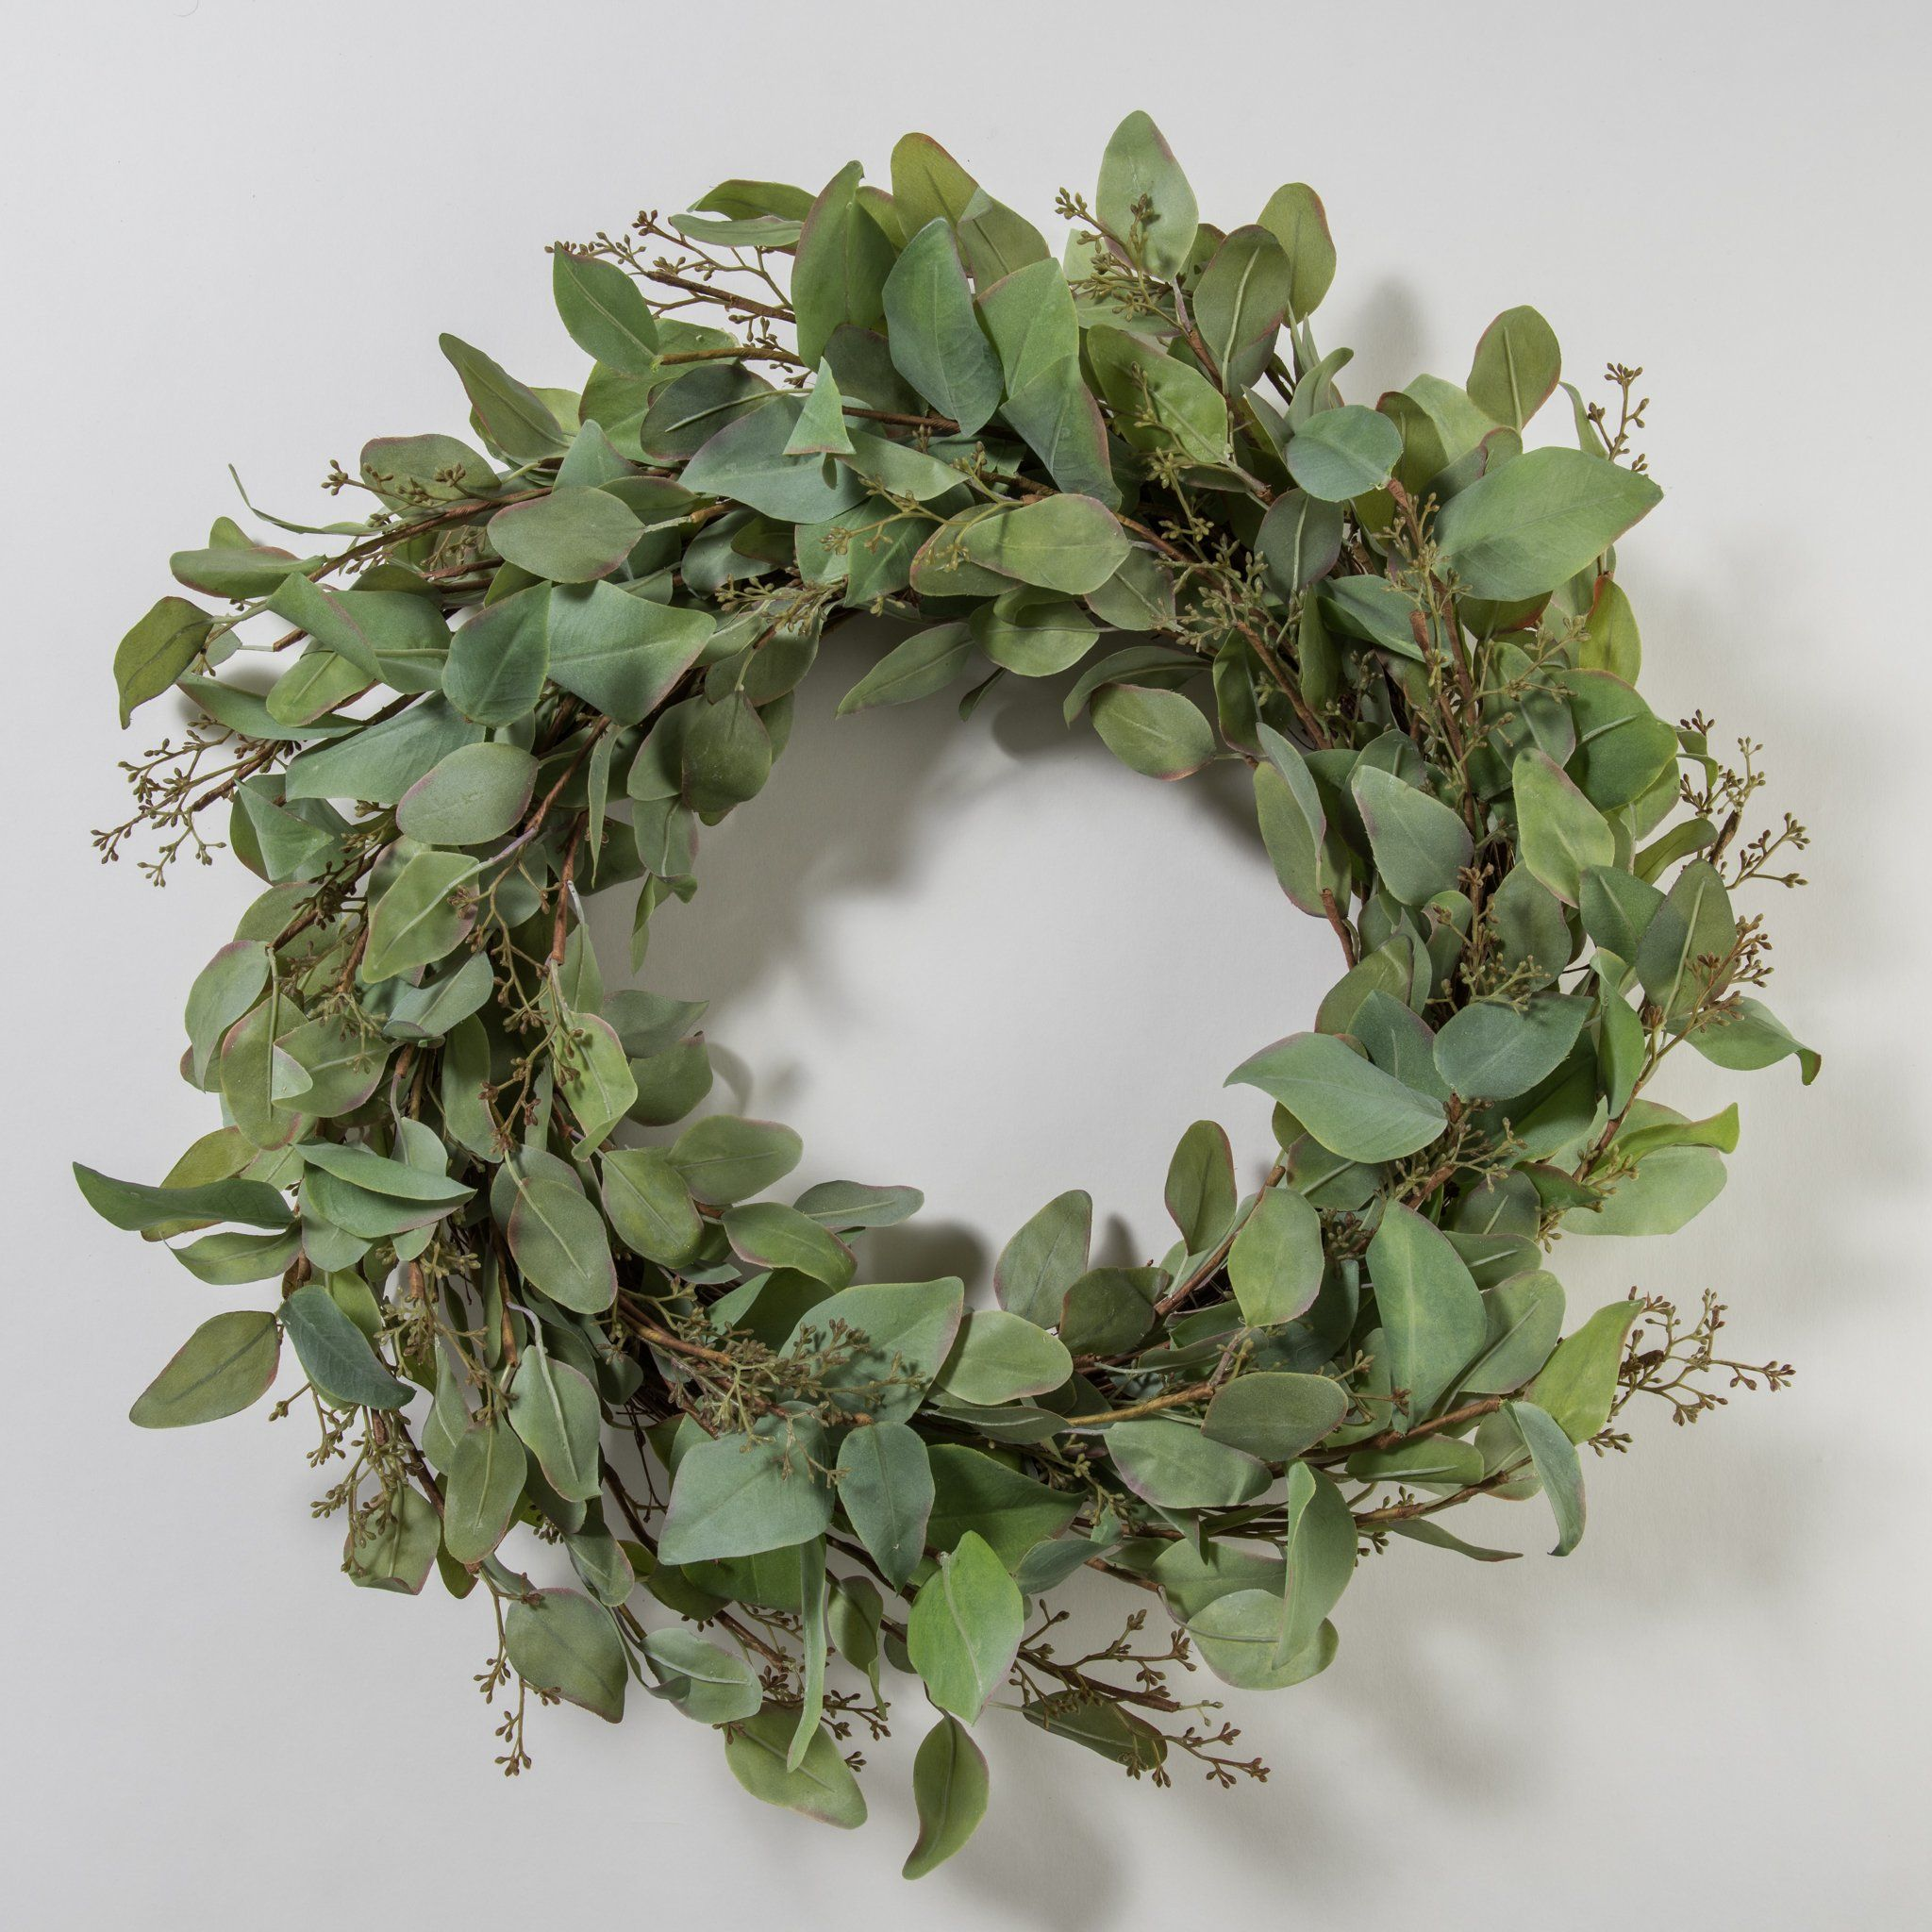 Eve Eucalyptus Wreath Eucalyptus Wreath Artificial Plants Small Artificial Plants